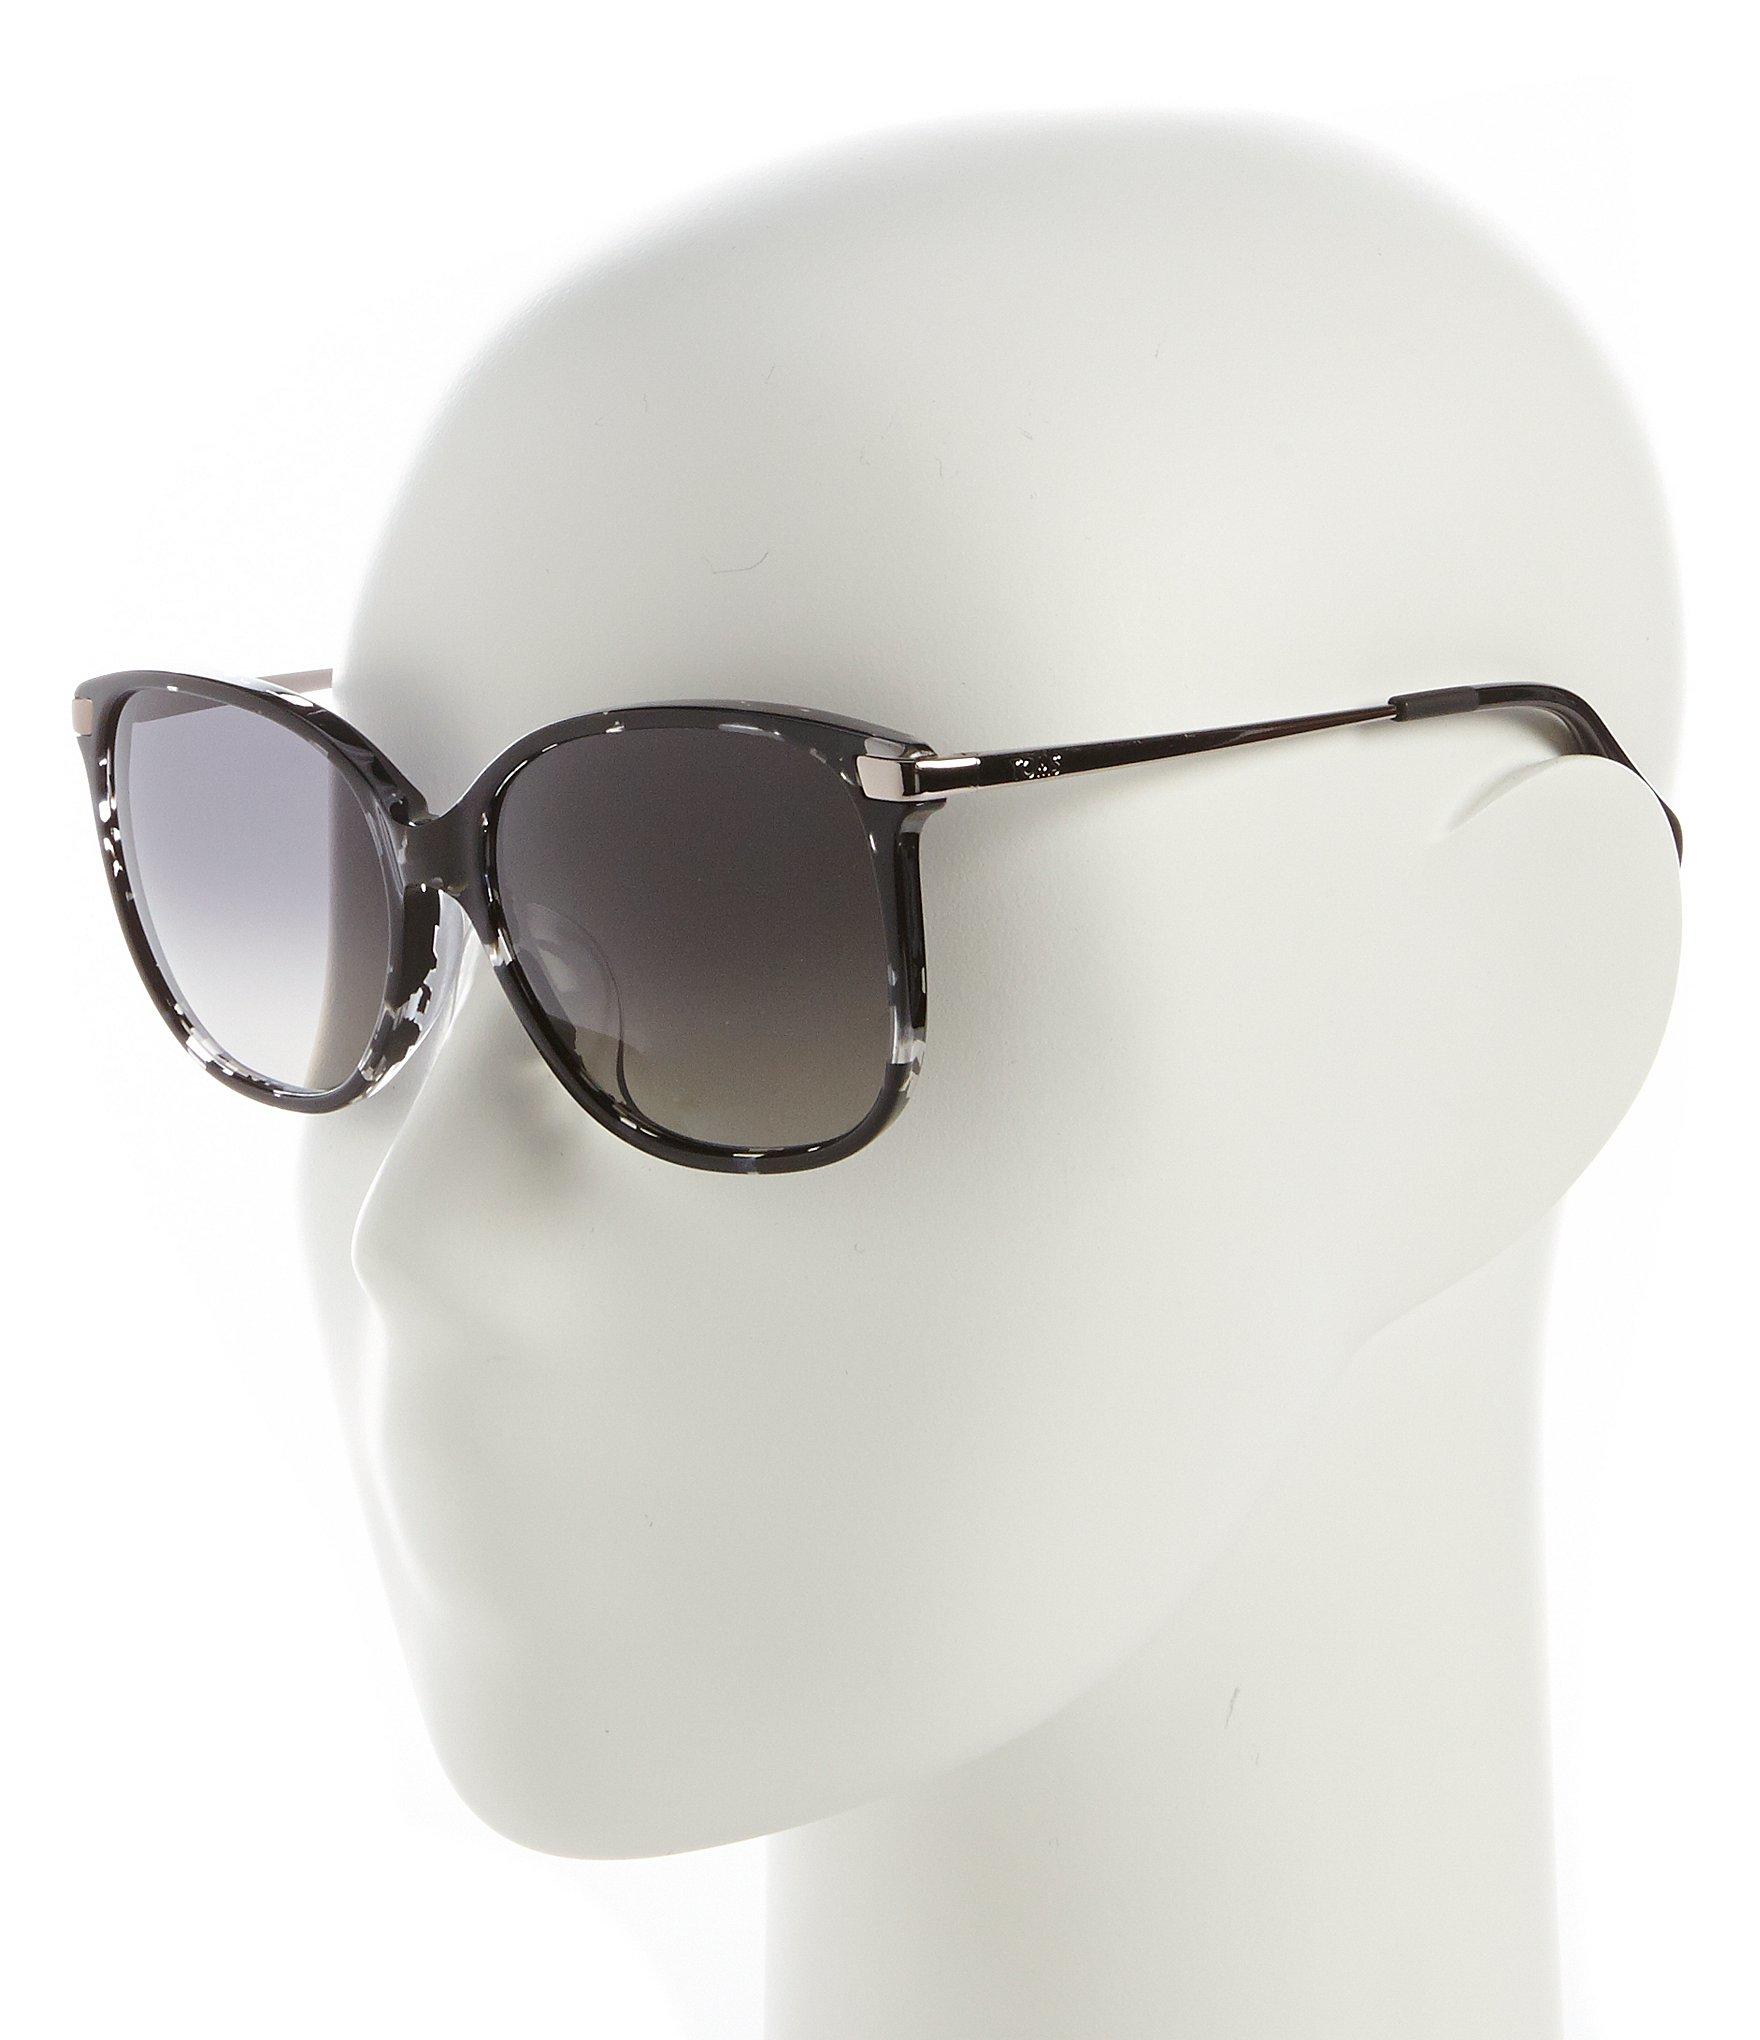 96e55d924054 Toms Sandela 201 Polarized Butterfly Sunglasses in Black